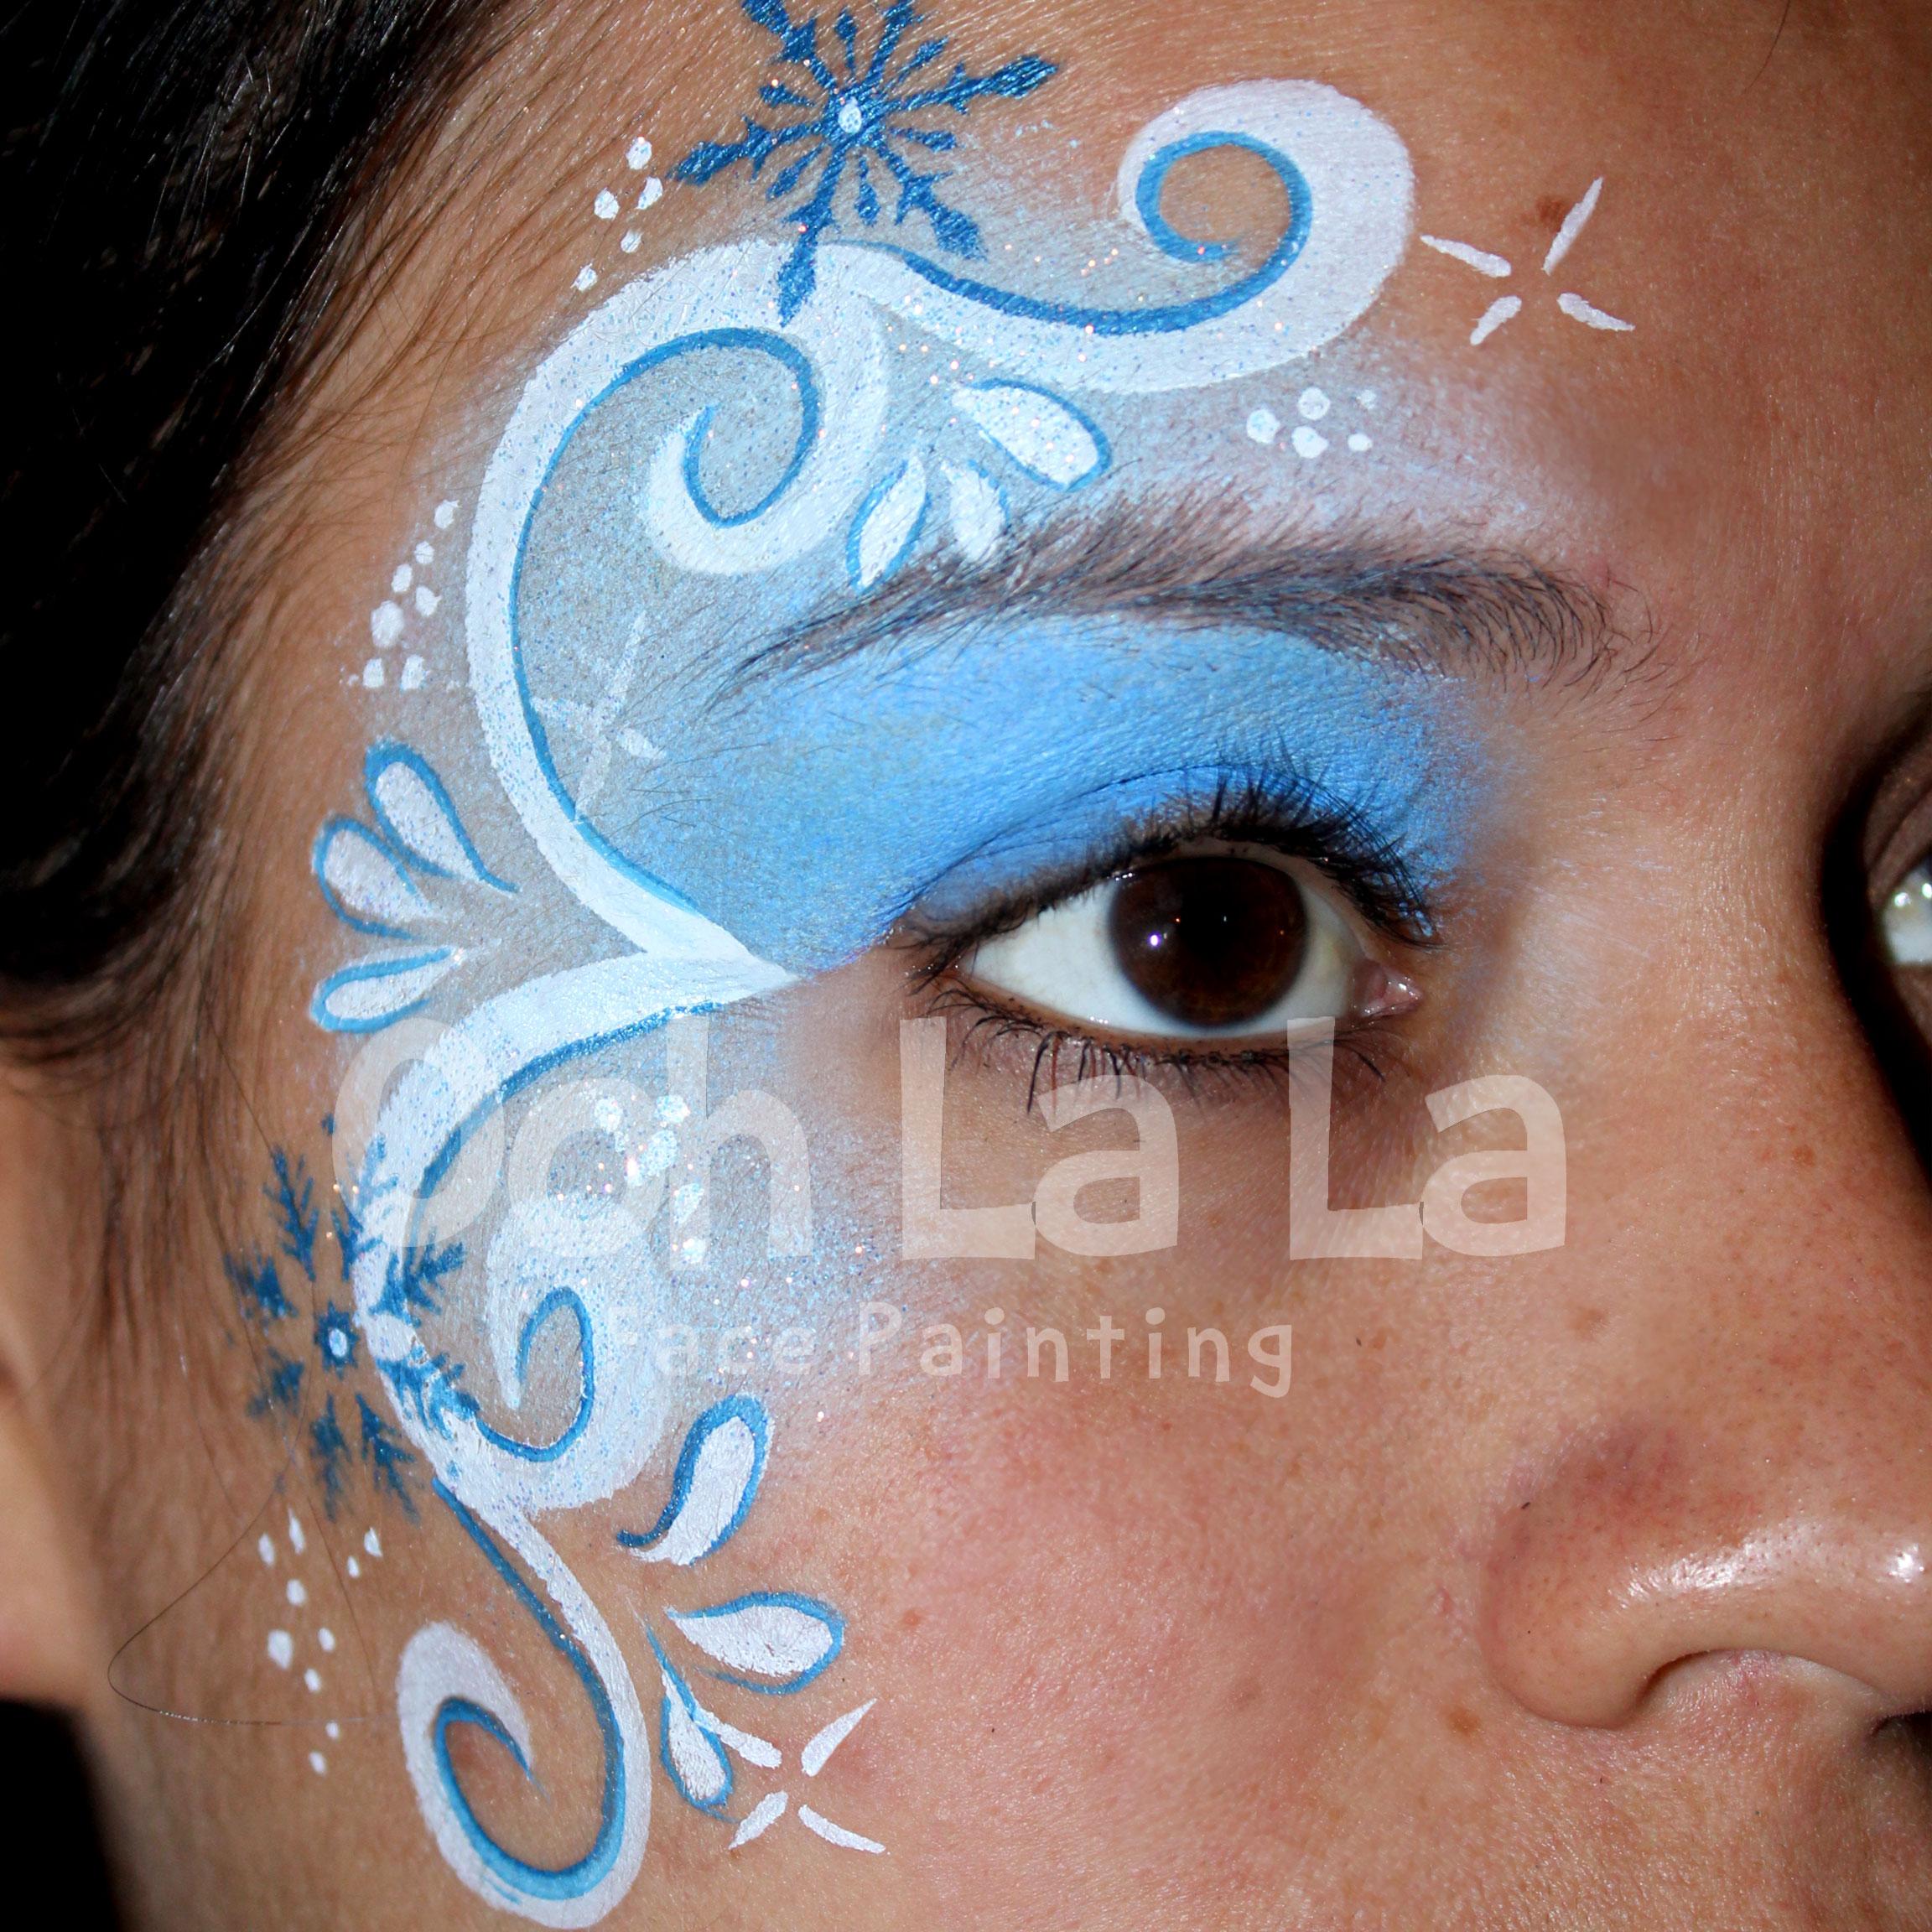 face-painter-los-angeles-ooh-lala-frozen.jpg